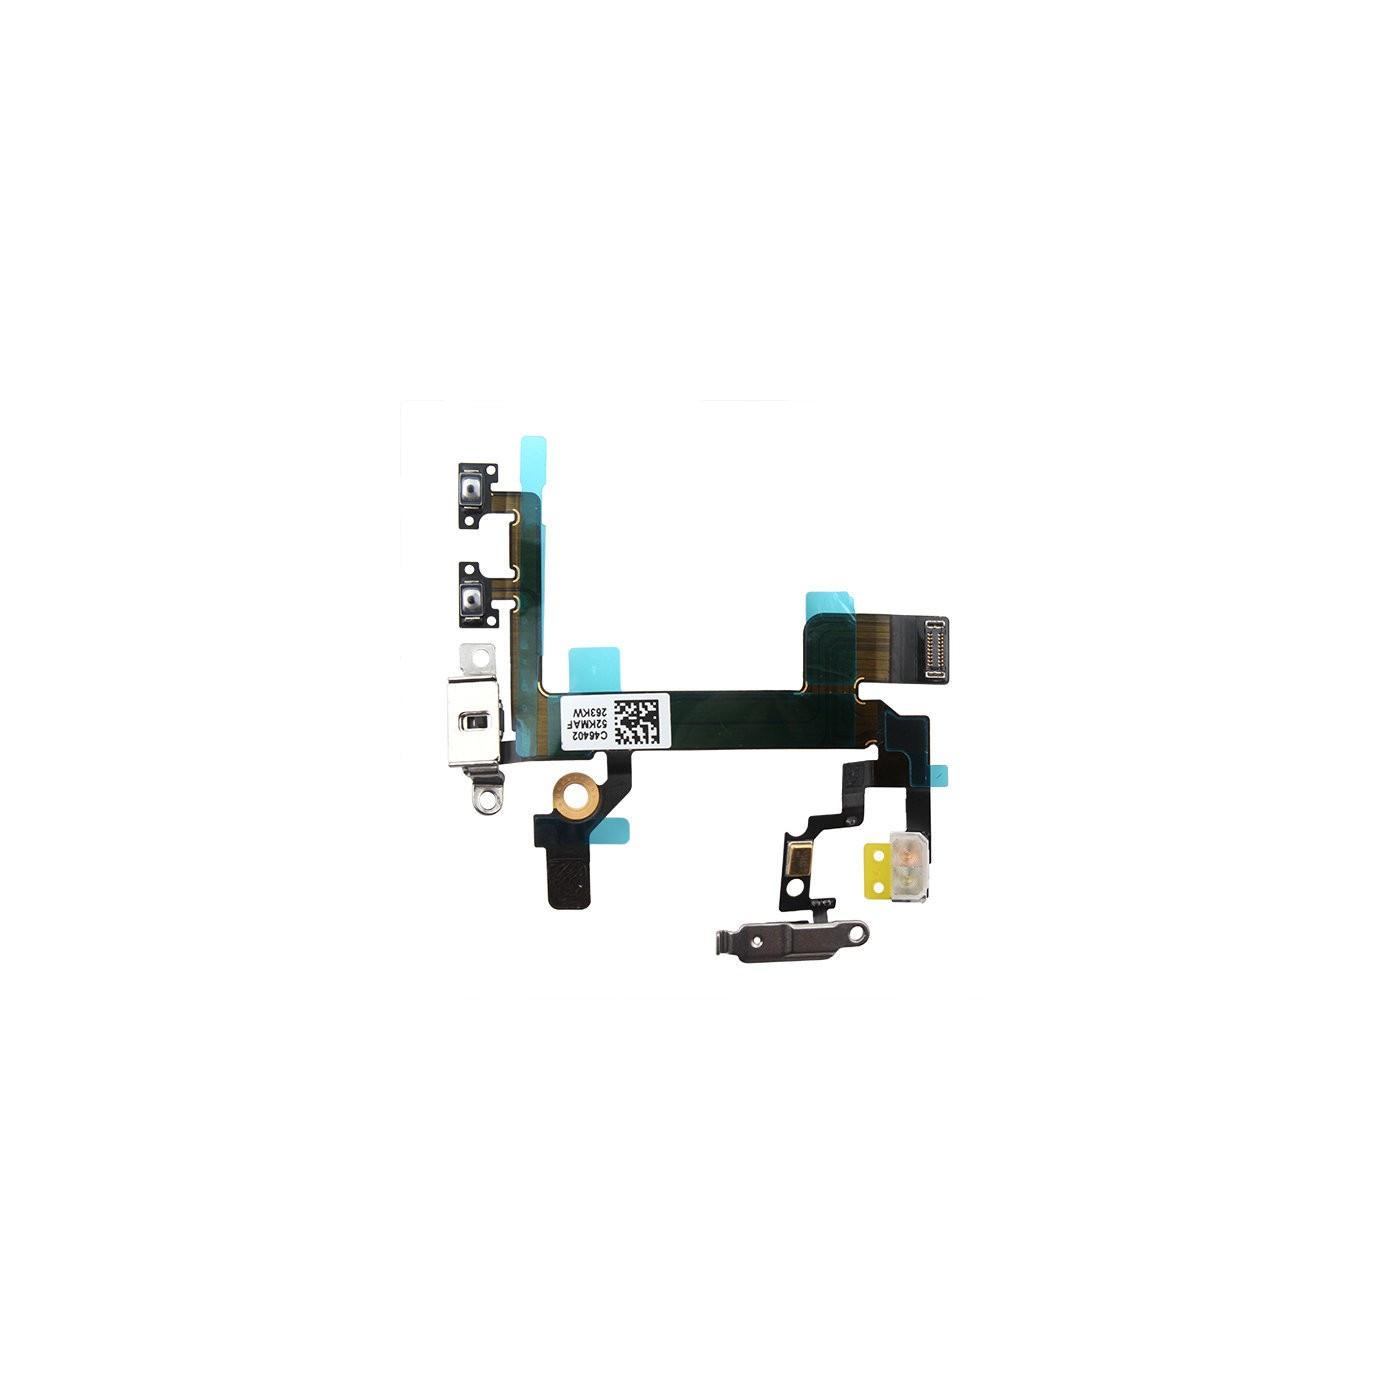 FLAT FLEX PER IPHONE 5S TASTO TASTI PULSANTE VOLUME MUTO POWER PLACCHE METALLO